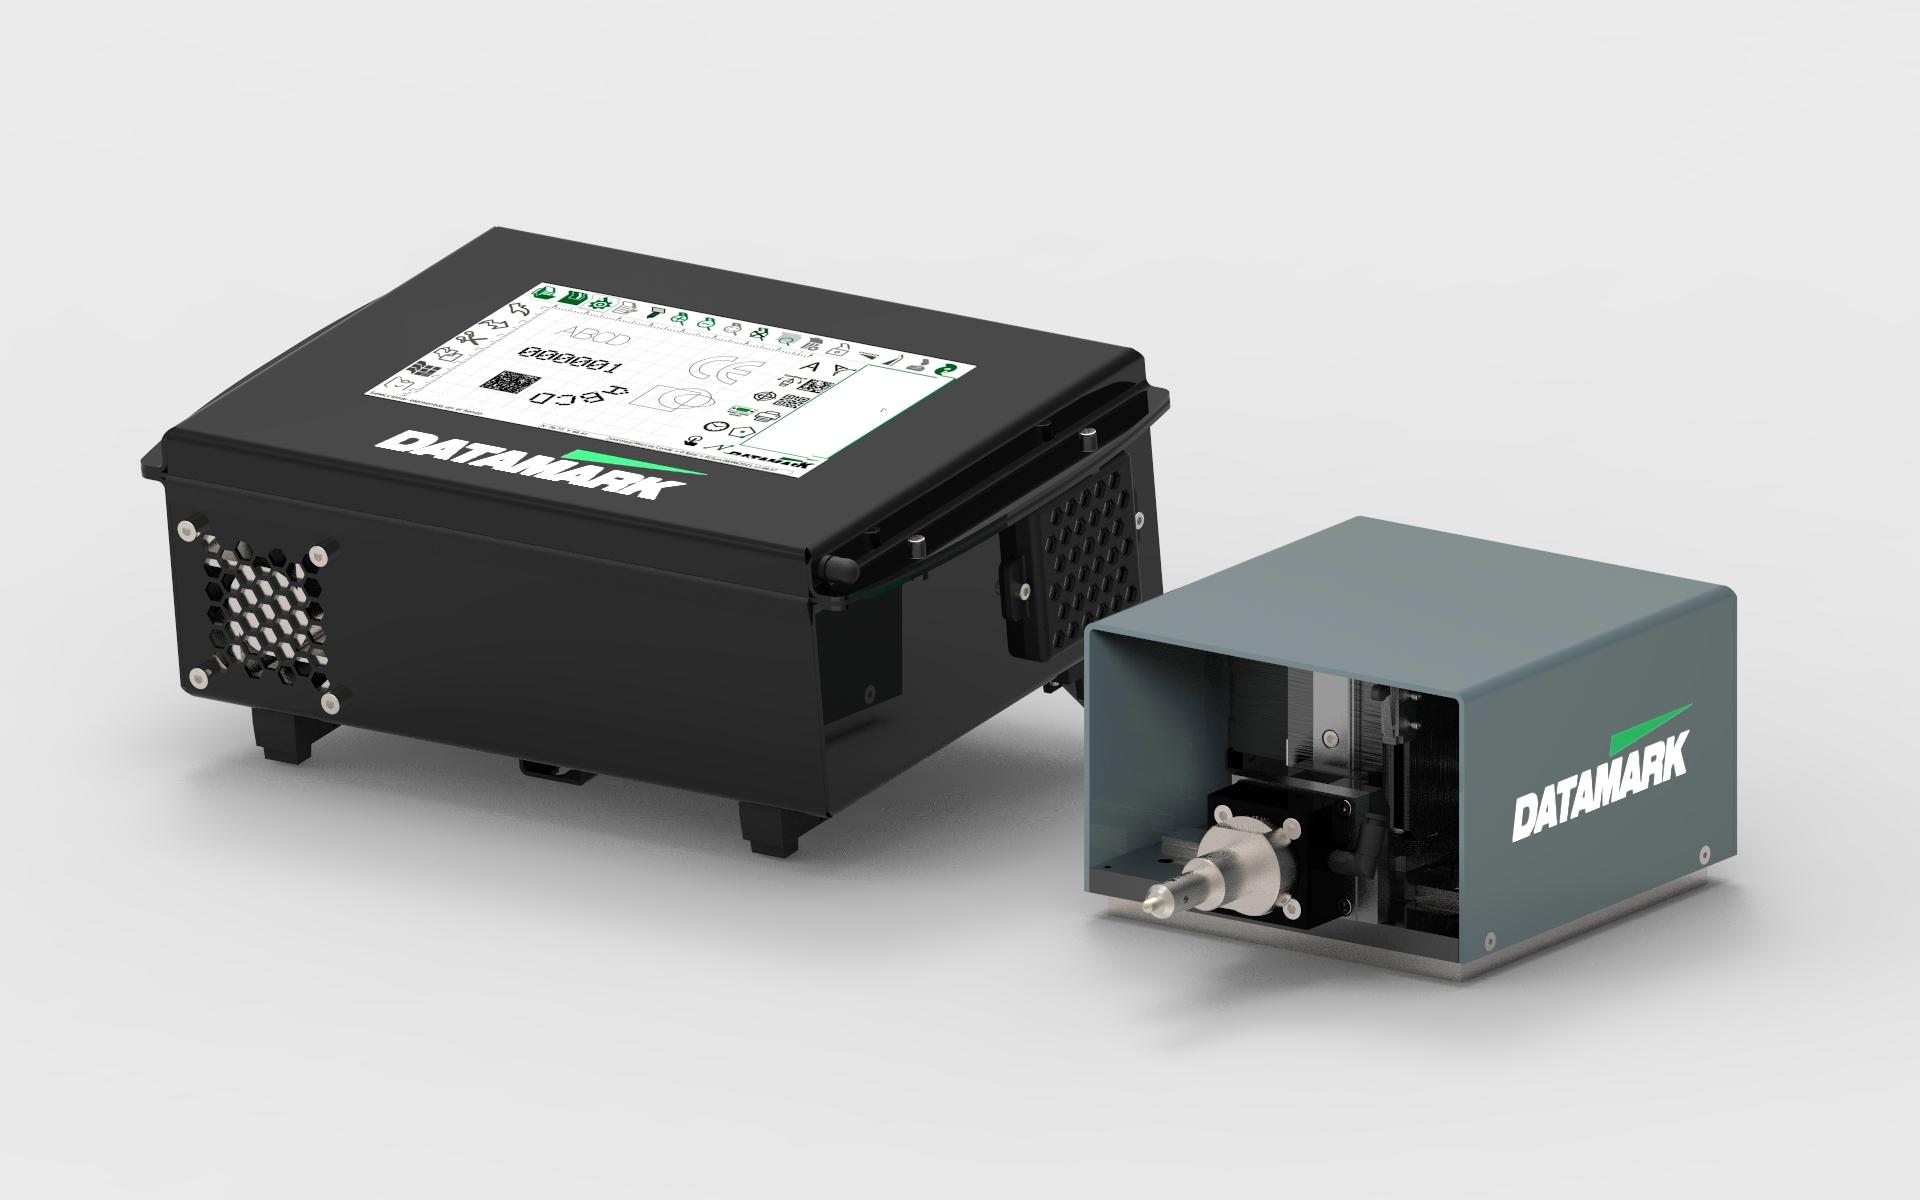 Datamark MP-80 integrable